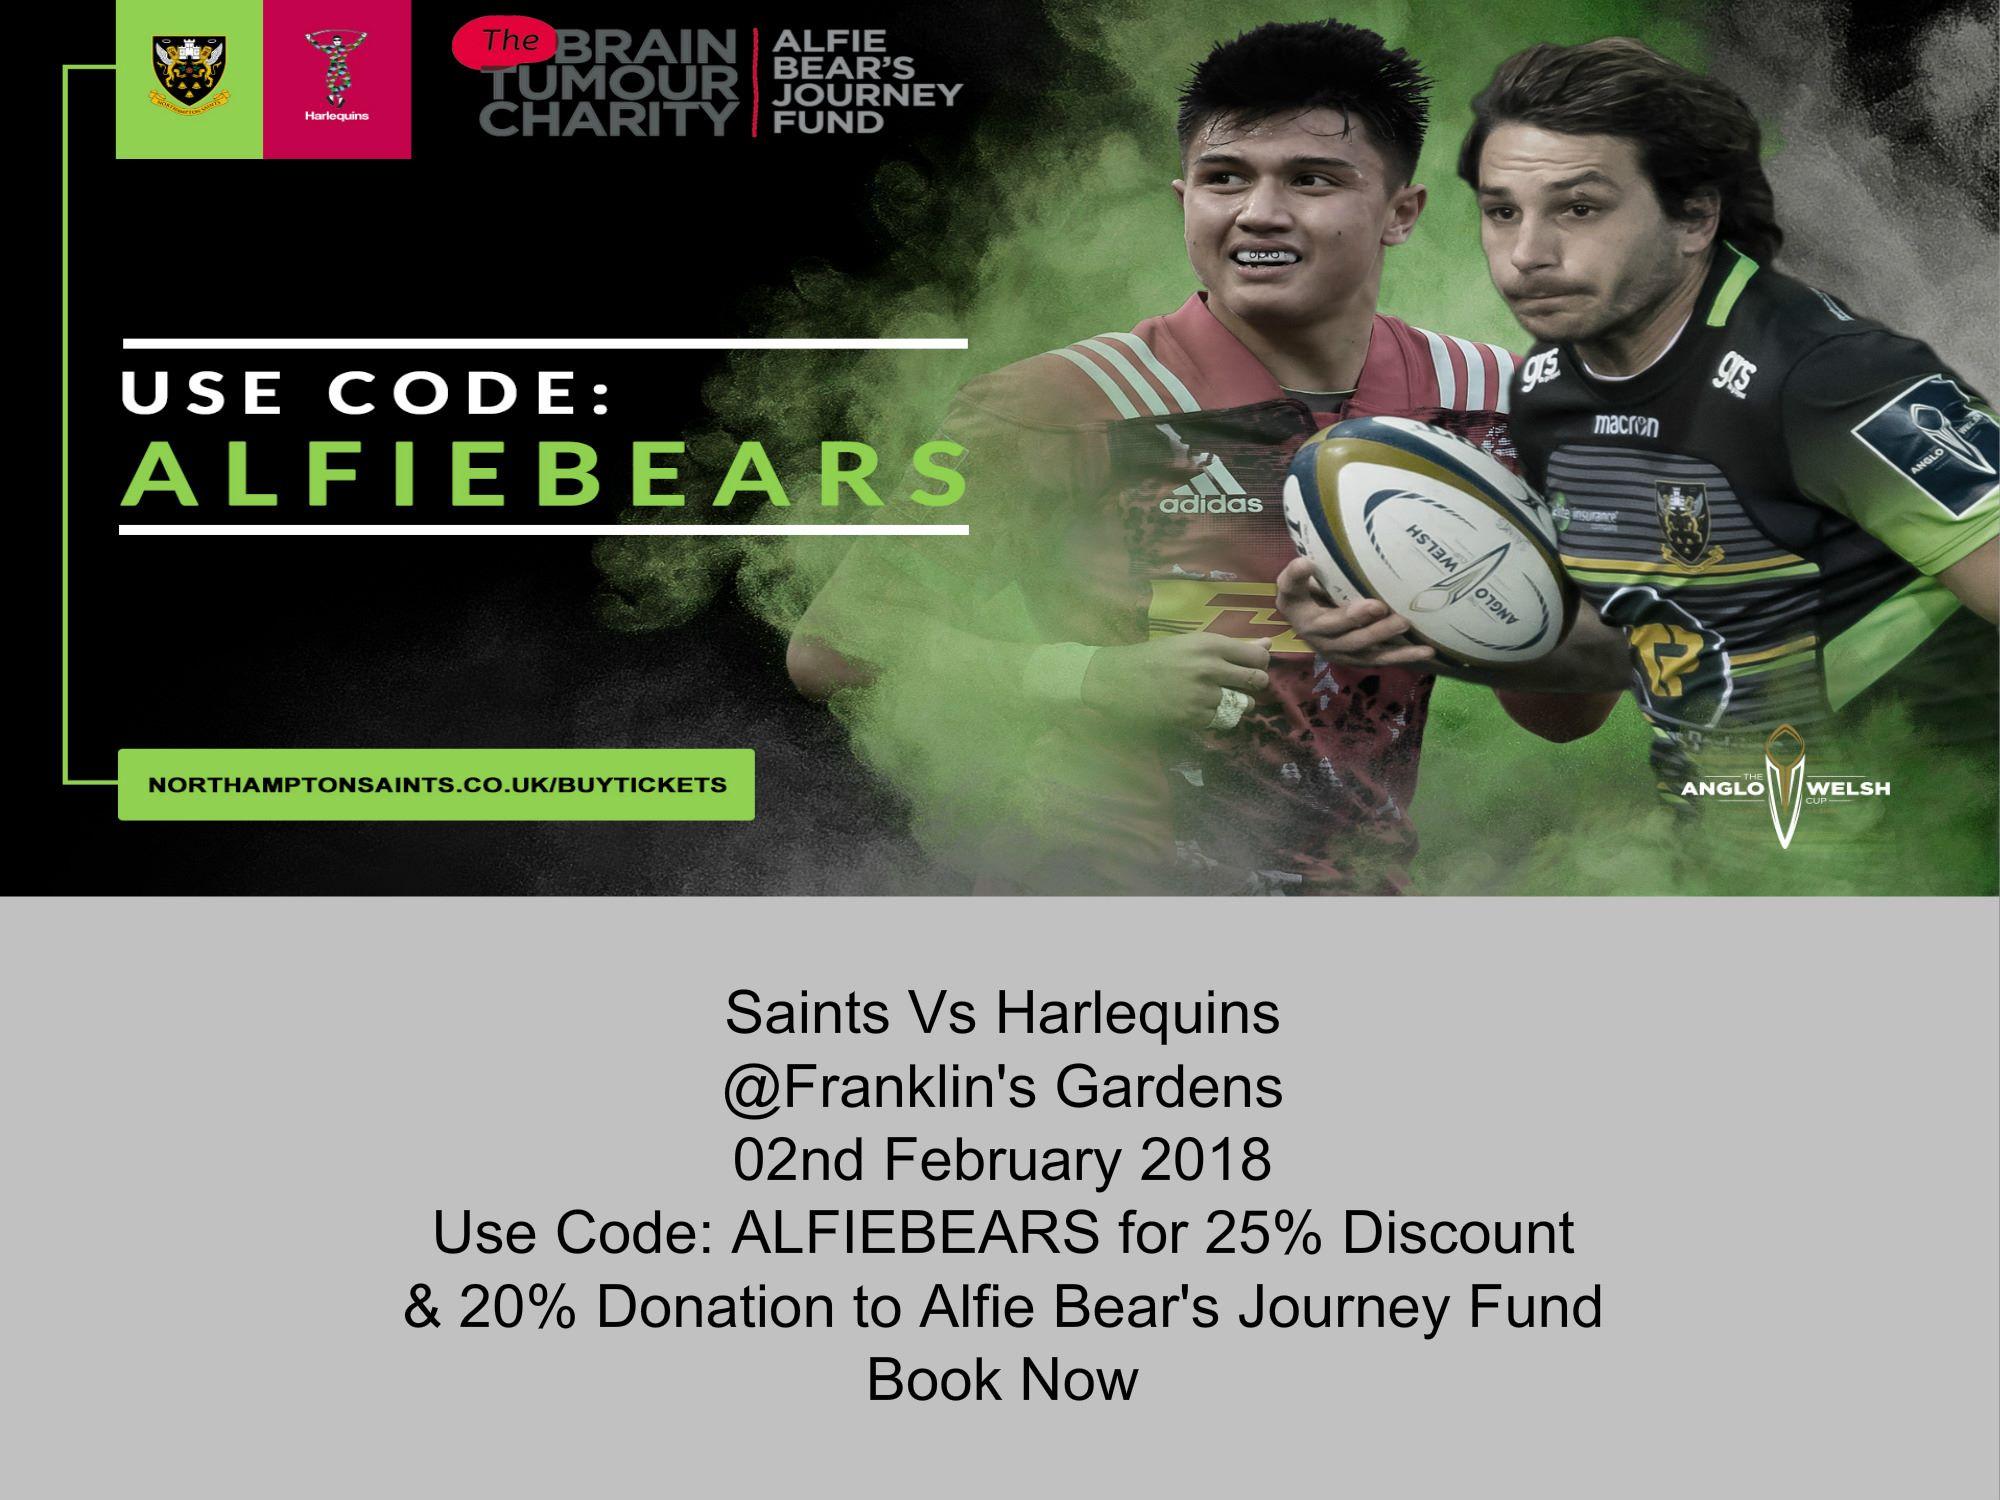 Saints Vs Harlequins Discount Code